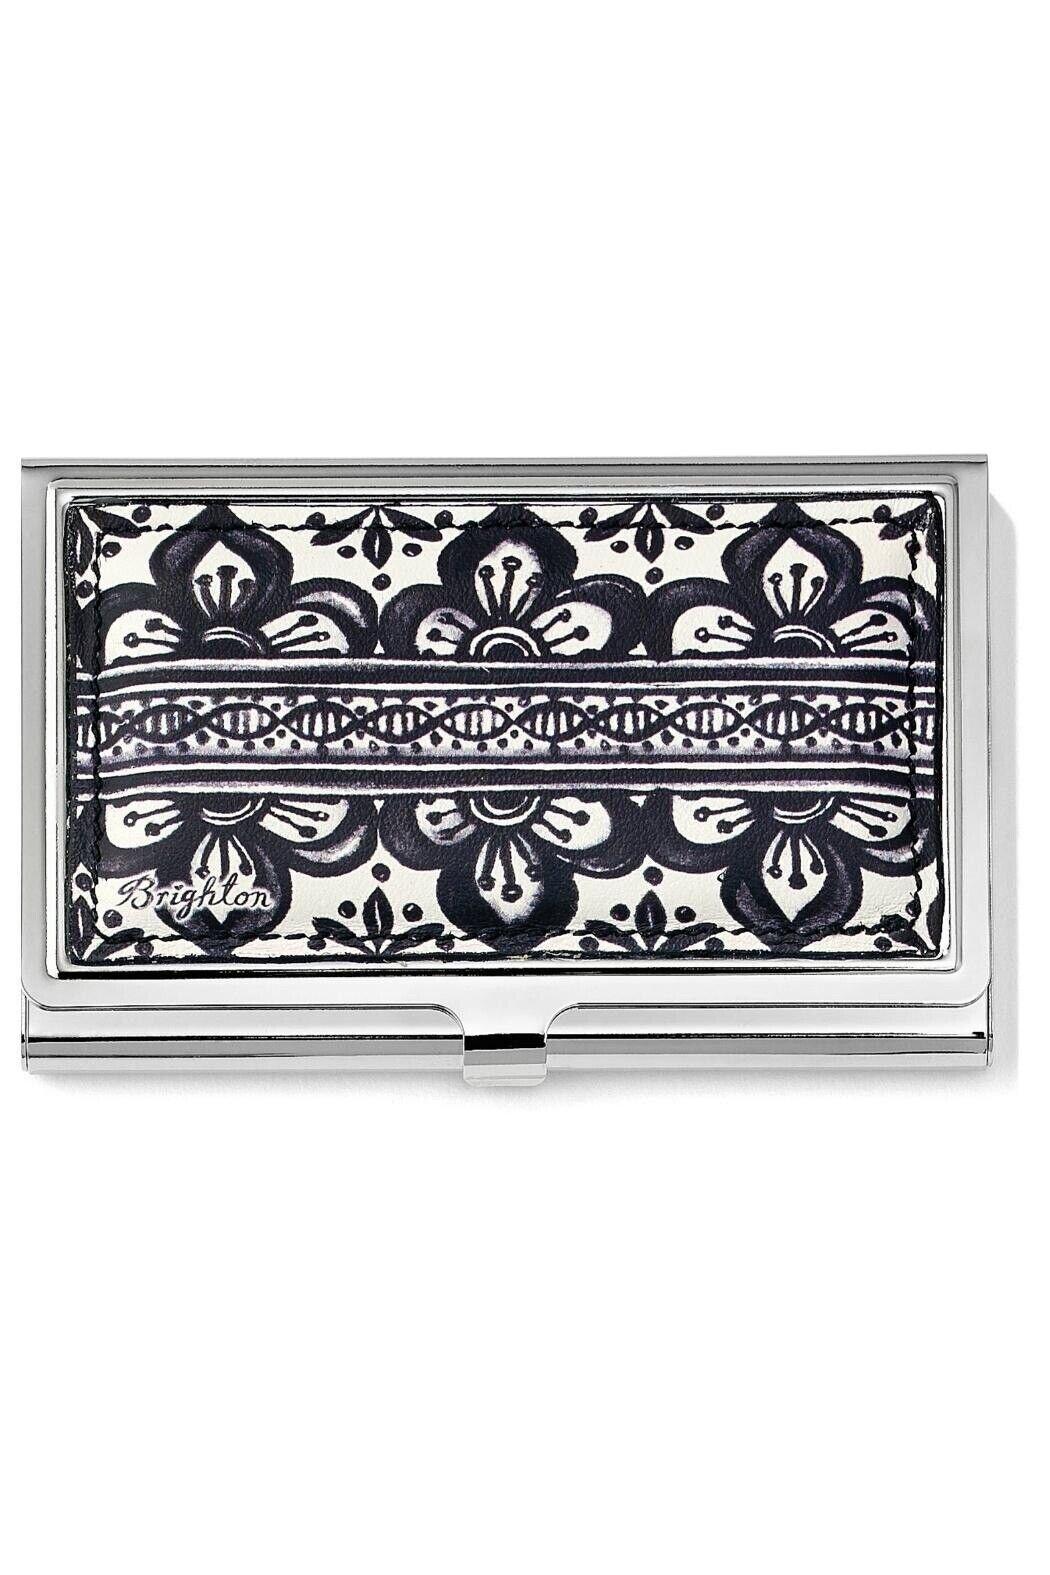 Brighton CASABLANCA White Black Leather Metal Card Case Holder